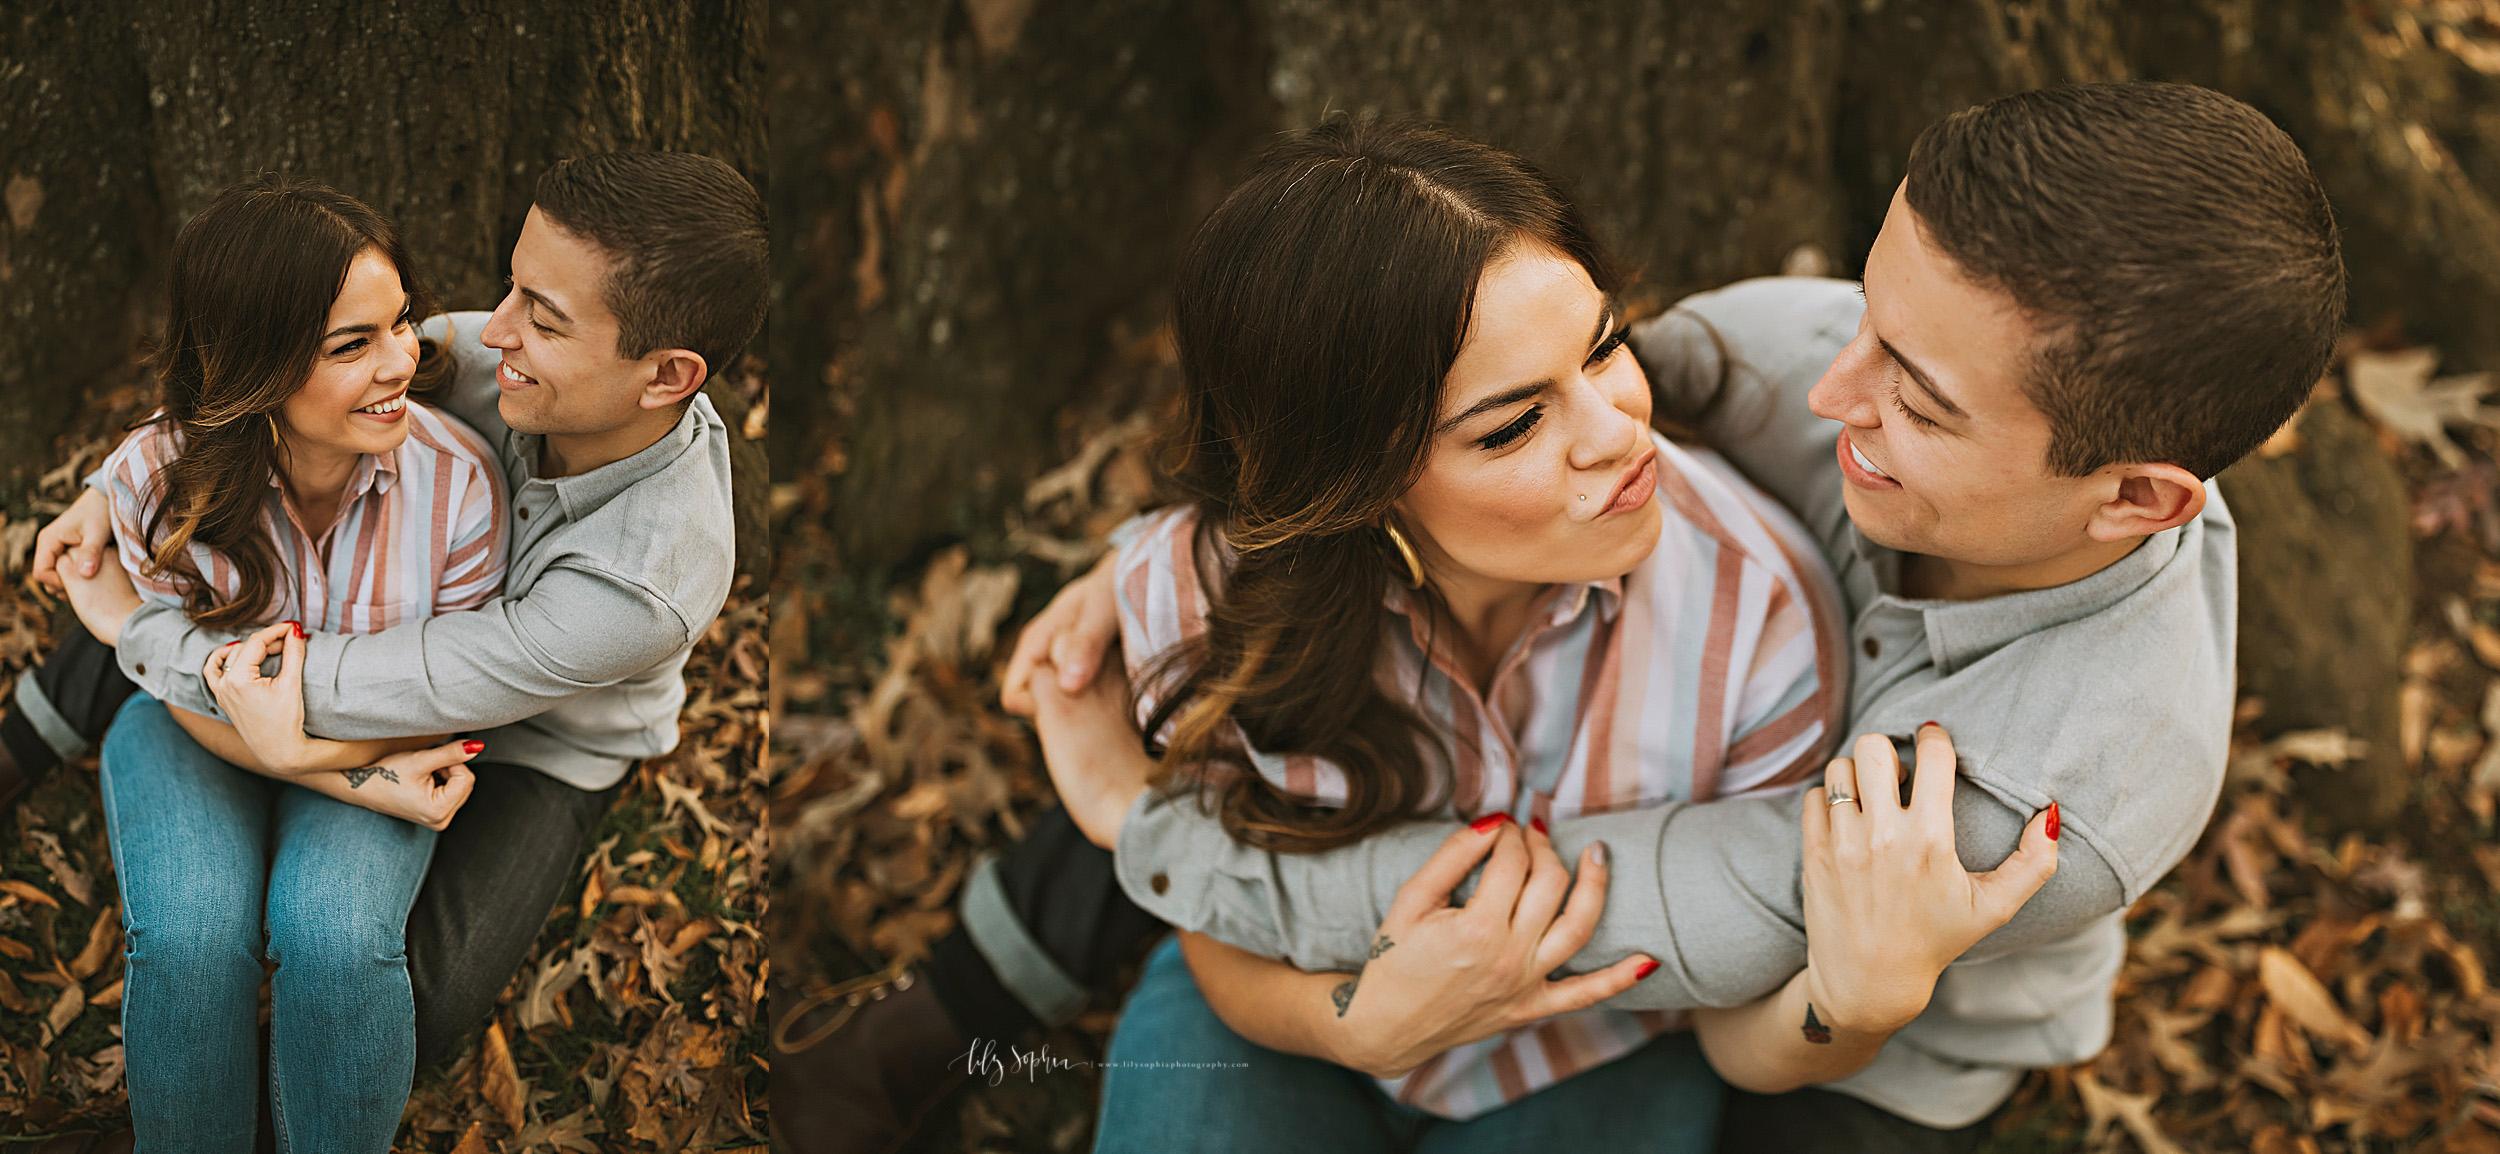 atlanta-reynoldstown-peoplestown-decatur-sandy-springs-buckhead-virginia-highlands-west-end-decatur-lily-sophia-photography-outdoor-fall-couples-photos_1472.jpg